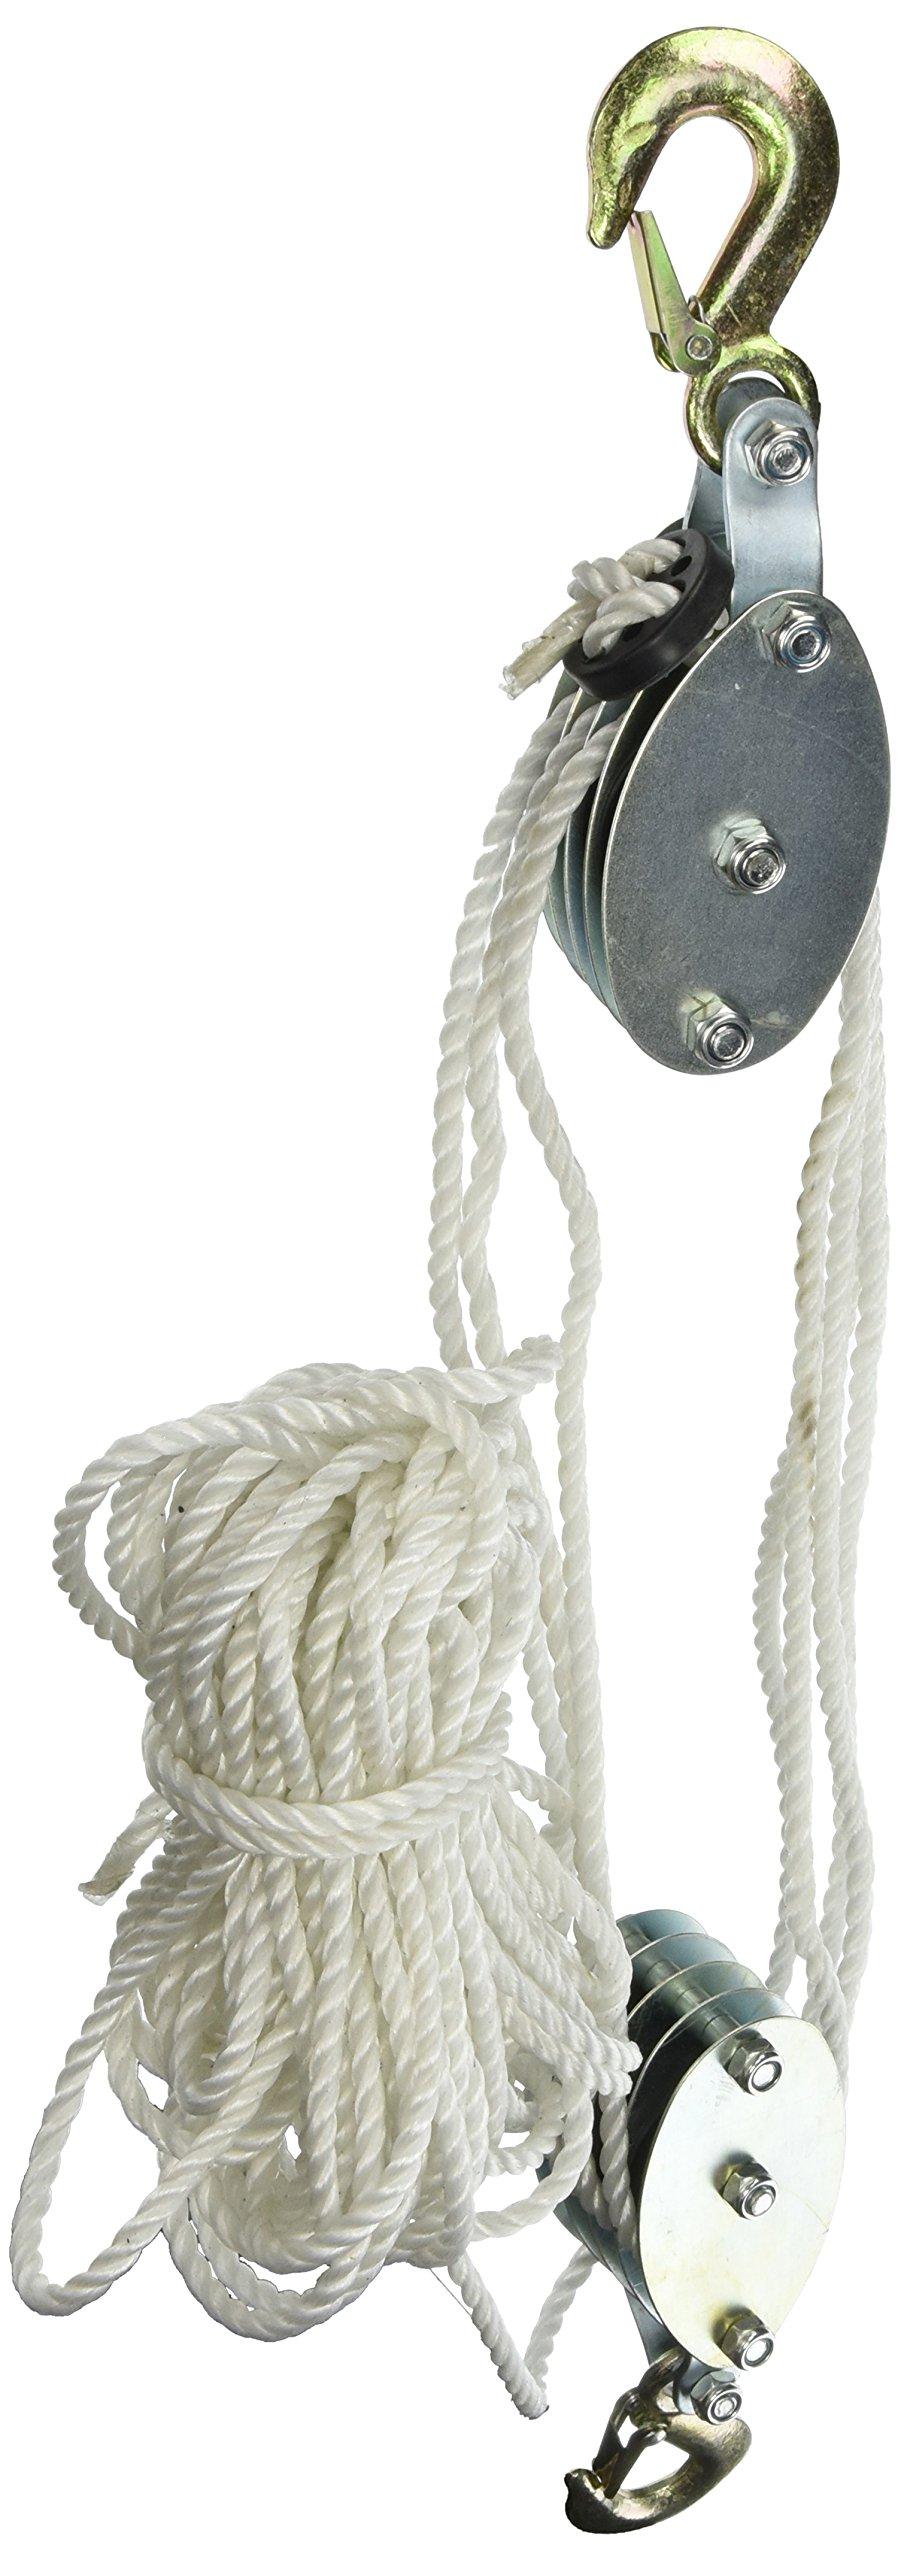 Grip 18095 2-Ton Rope Pulley Hoist